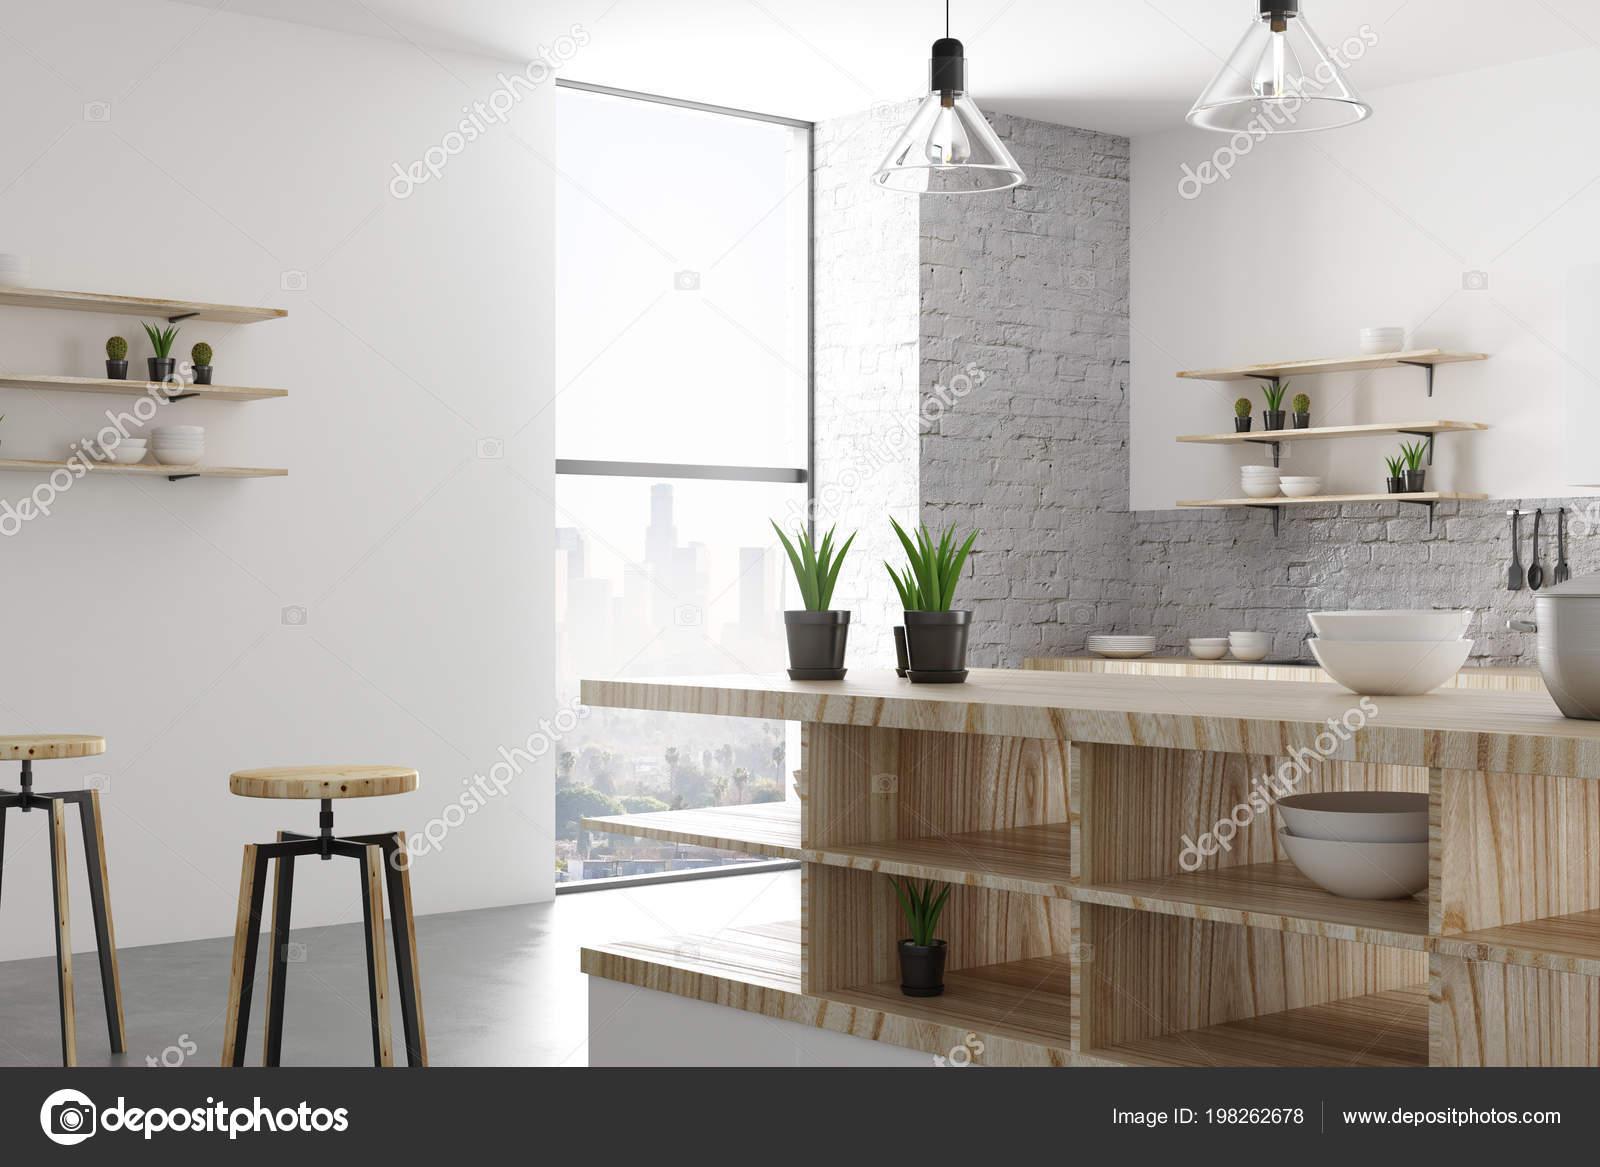 Witte Lichte Loft Keuken Interieur Met Meubels Apparaten Daglicht ...